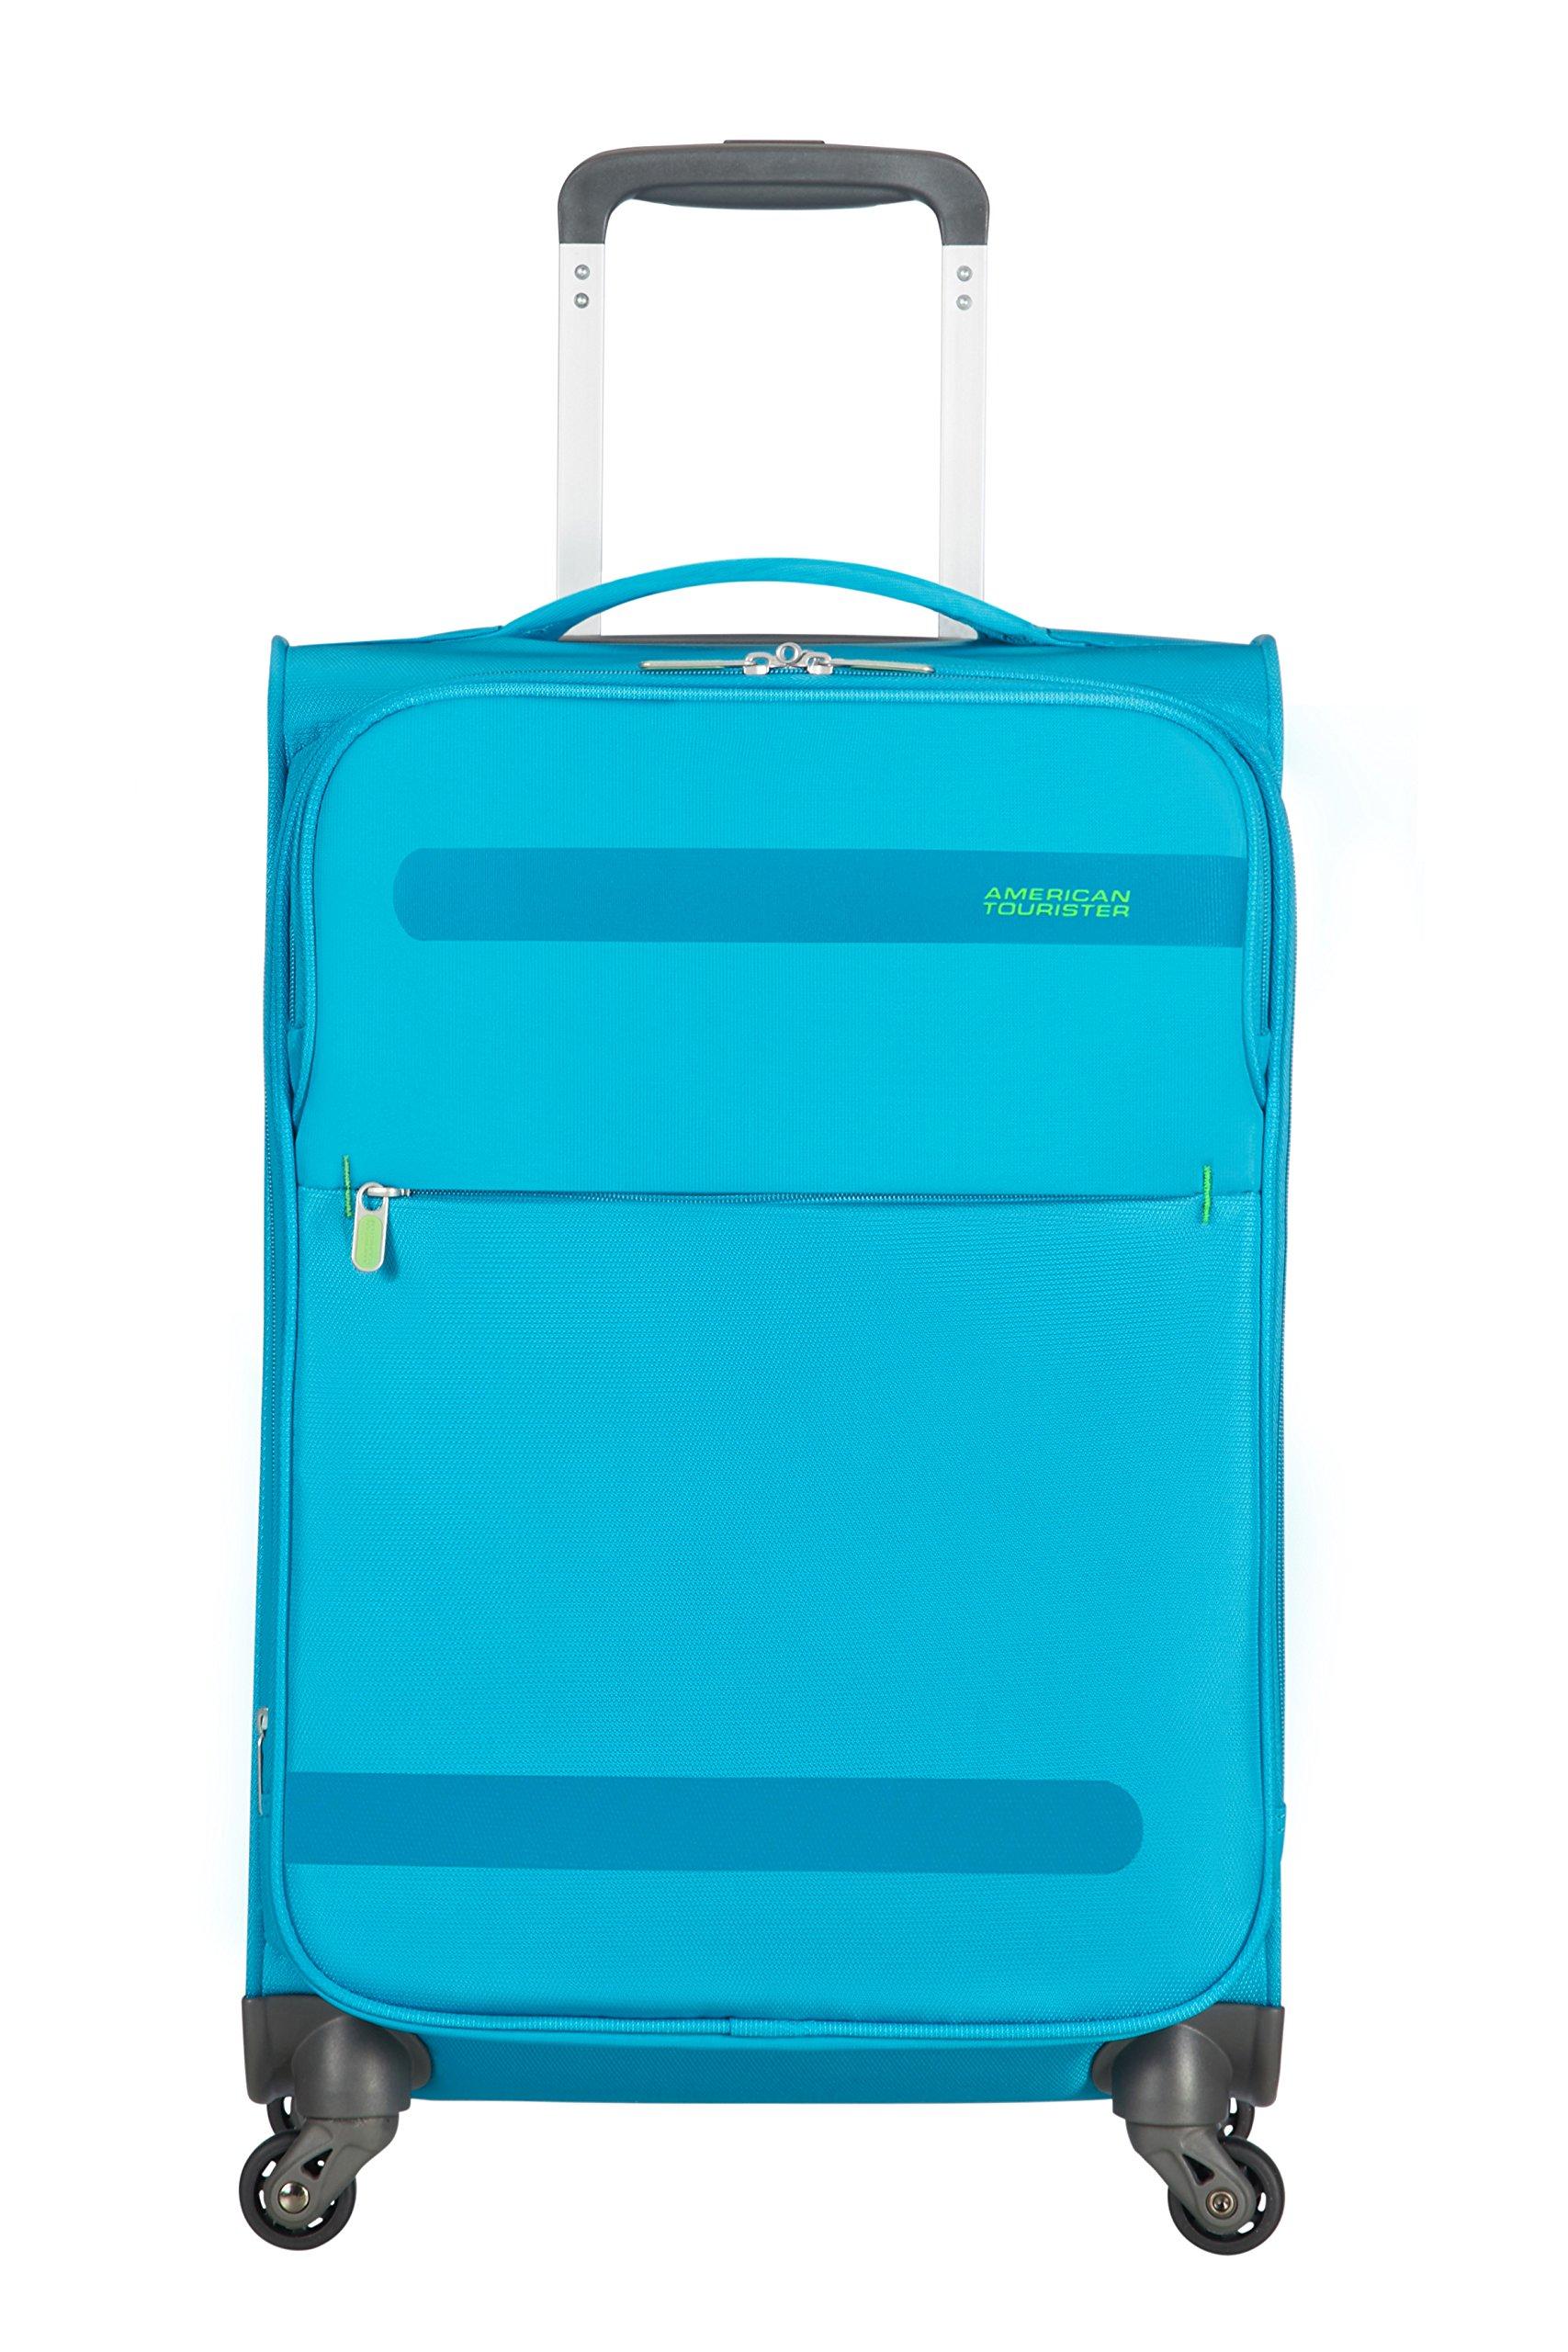 American Tourister Herolite Maleta, Azul (MIDNIGHT BLUE), S EXP (55cm-42L)